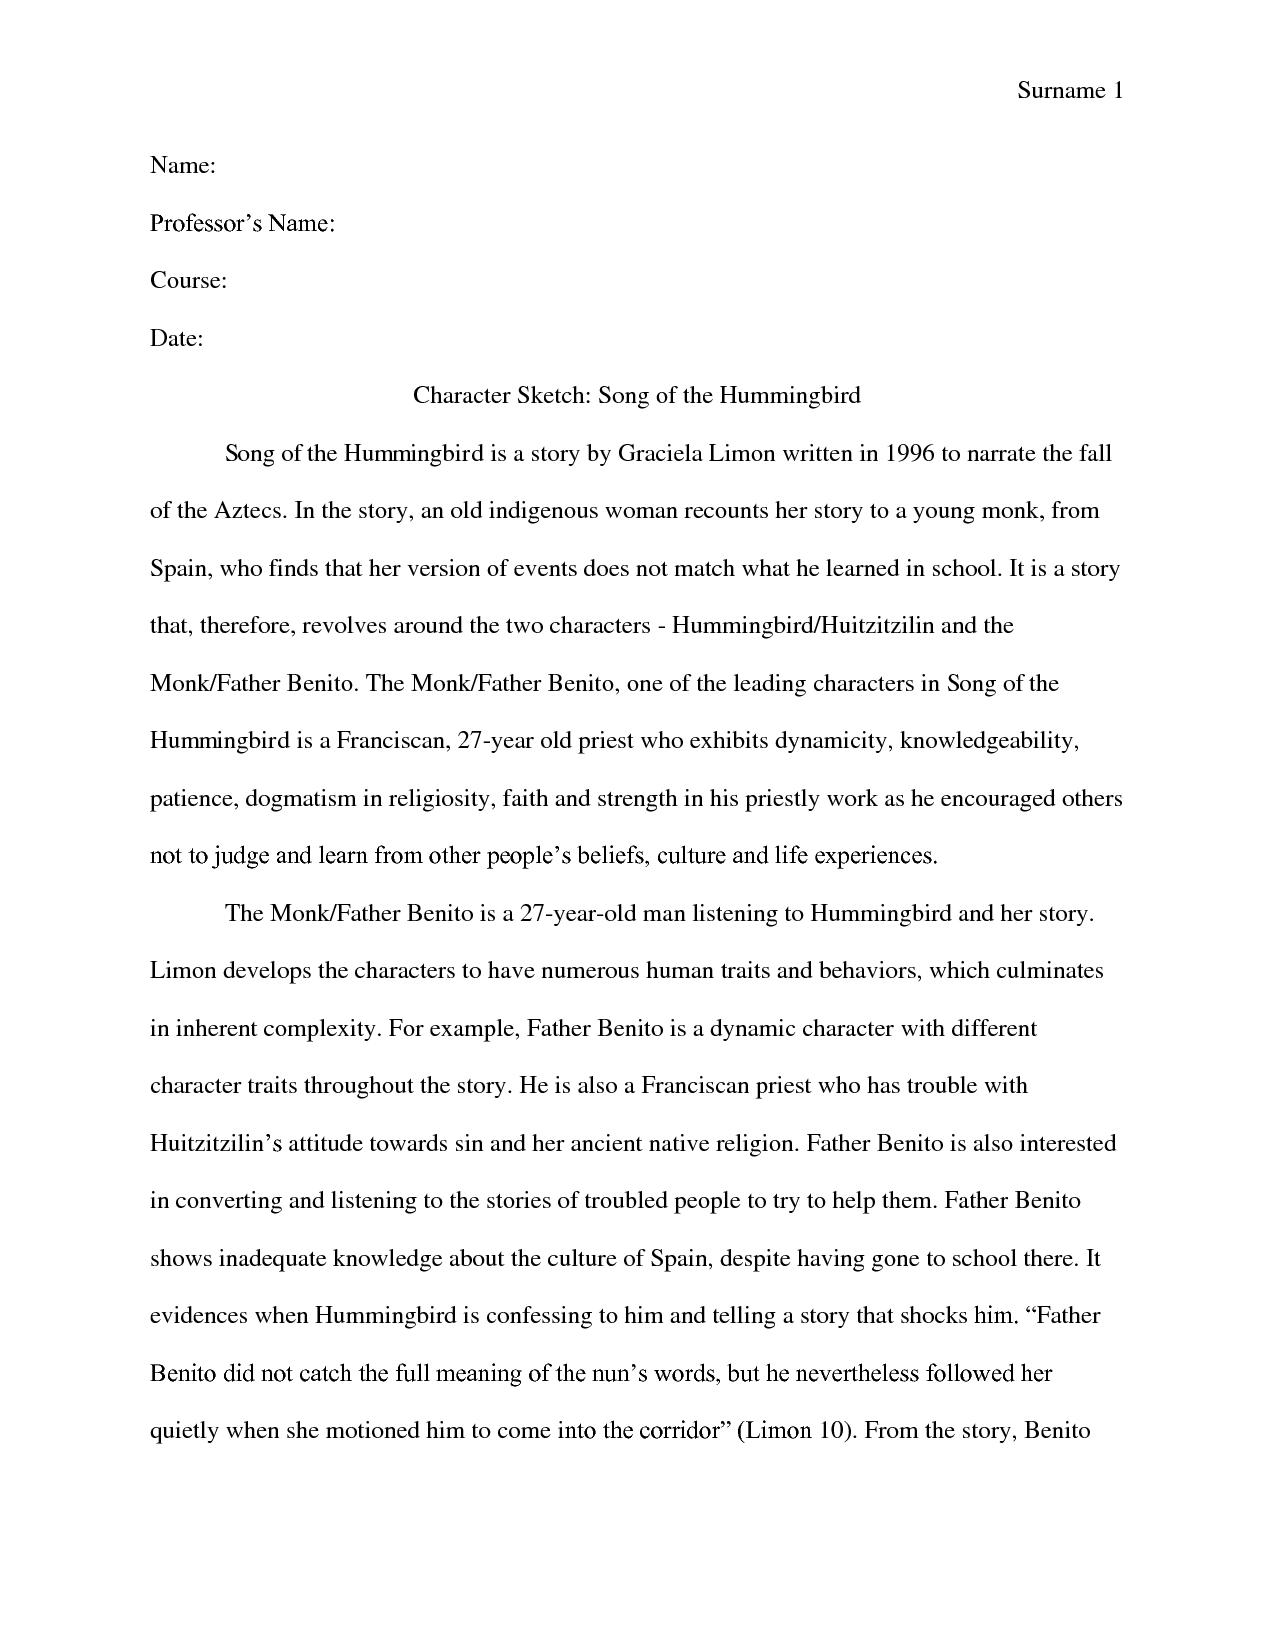 Essay song hummingbird high school homework organizer